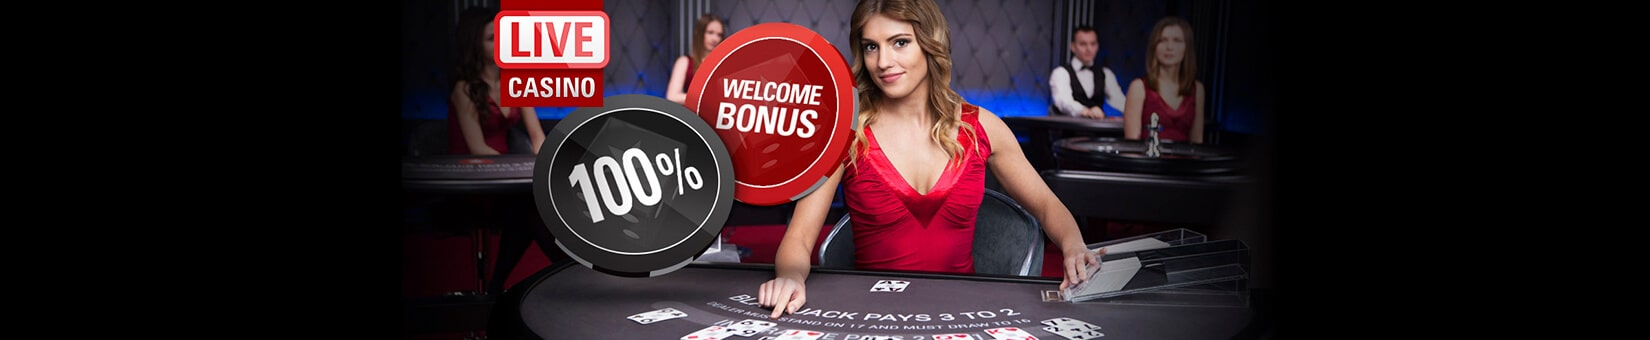 bonus i online casino Live Dealers